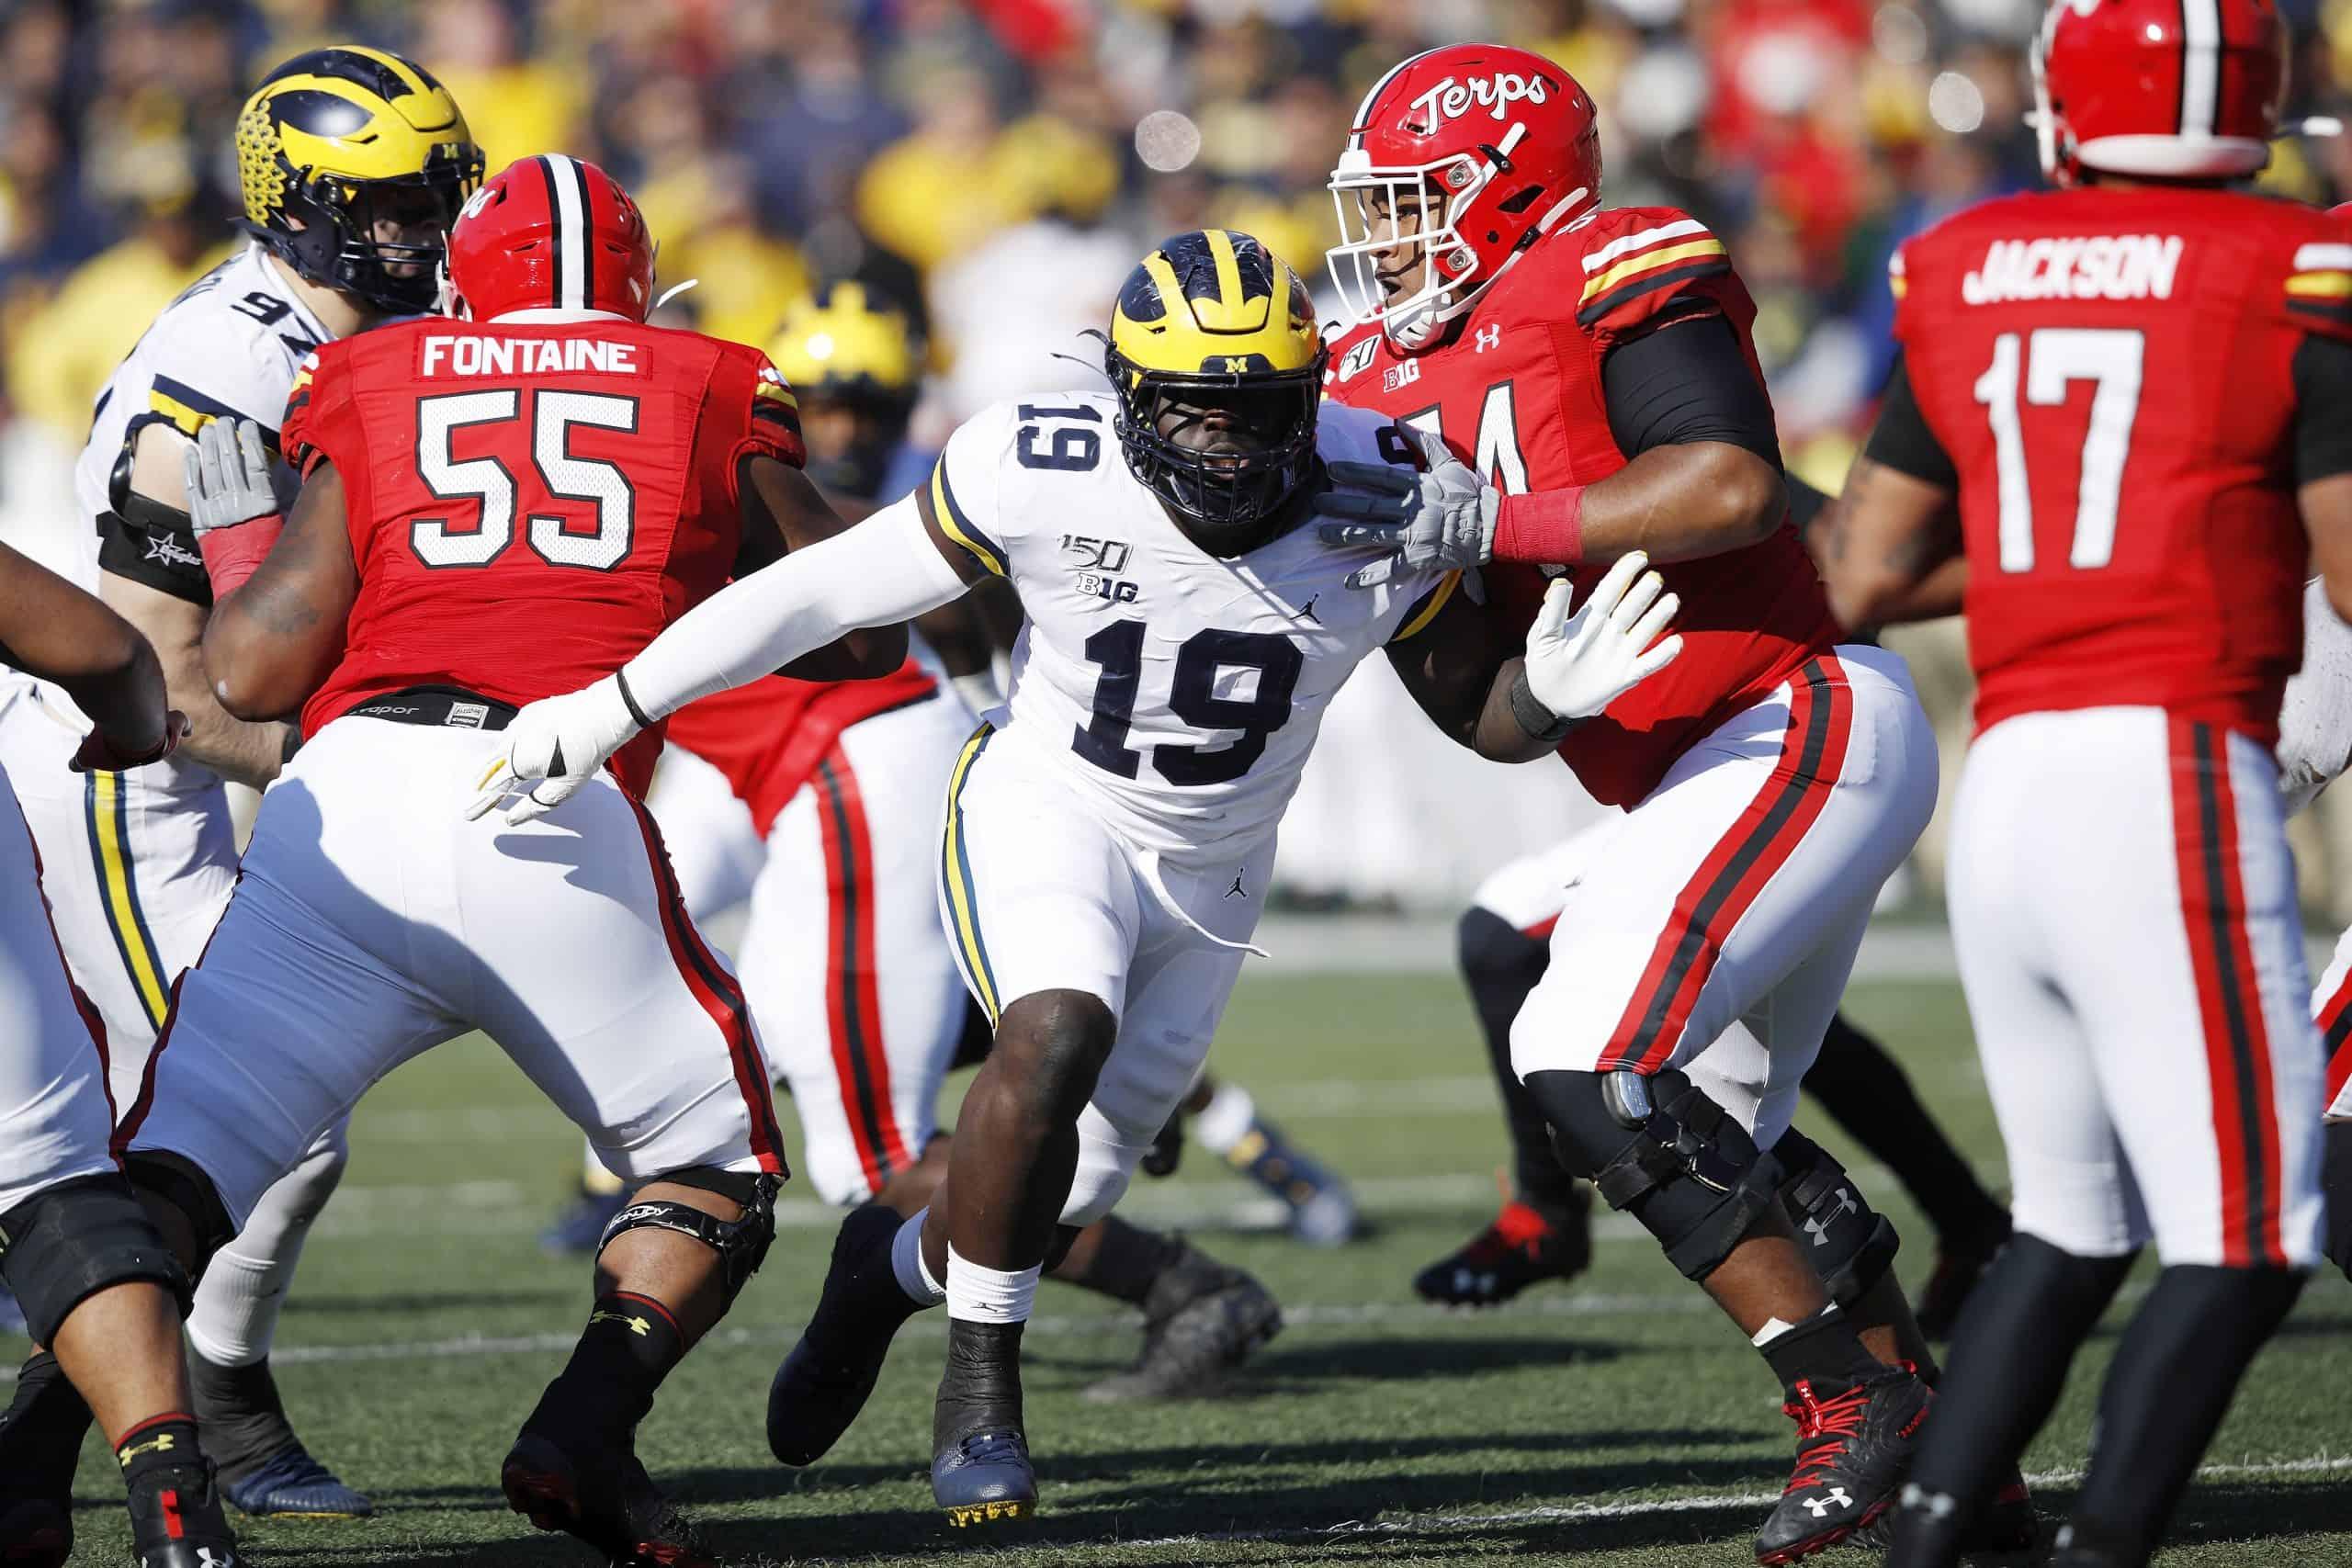 Kwity Paye, EDGE, Michigan - NFL Draft Player Profile